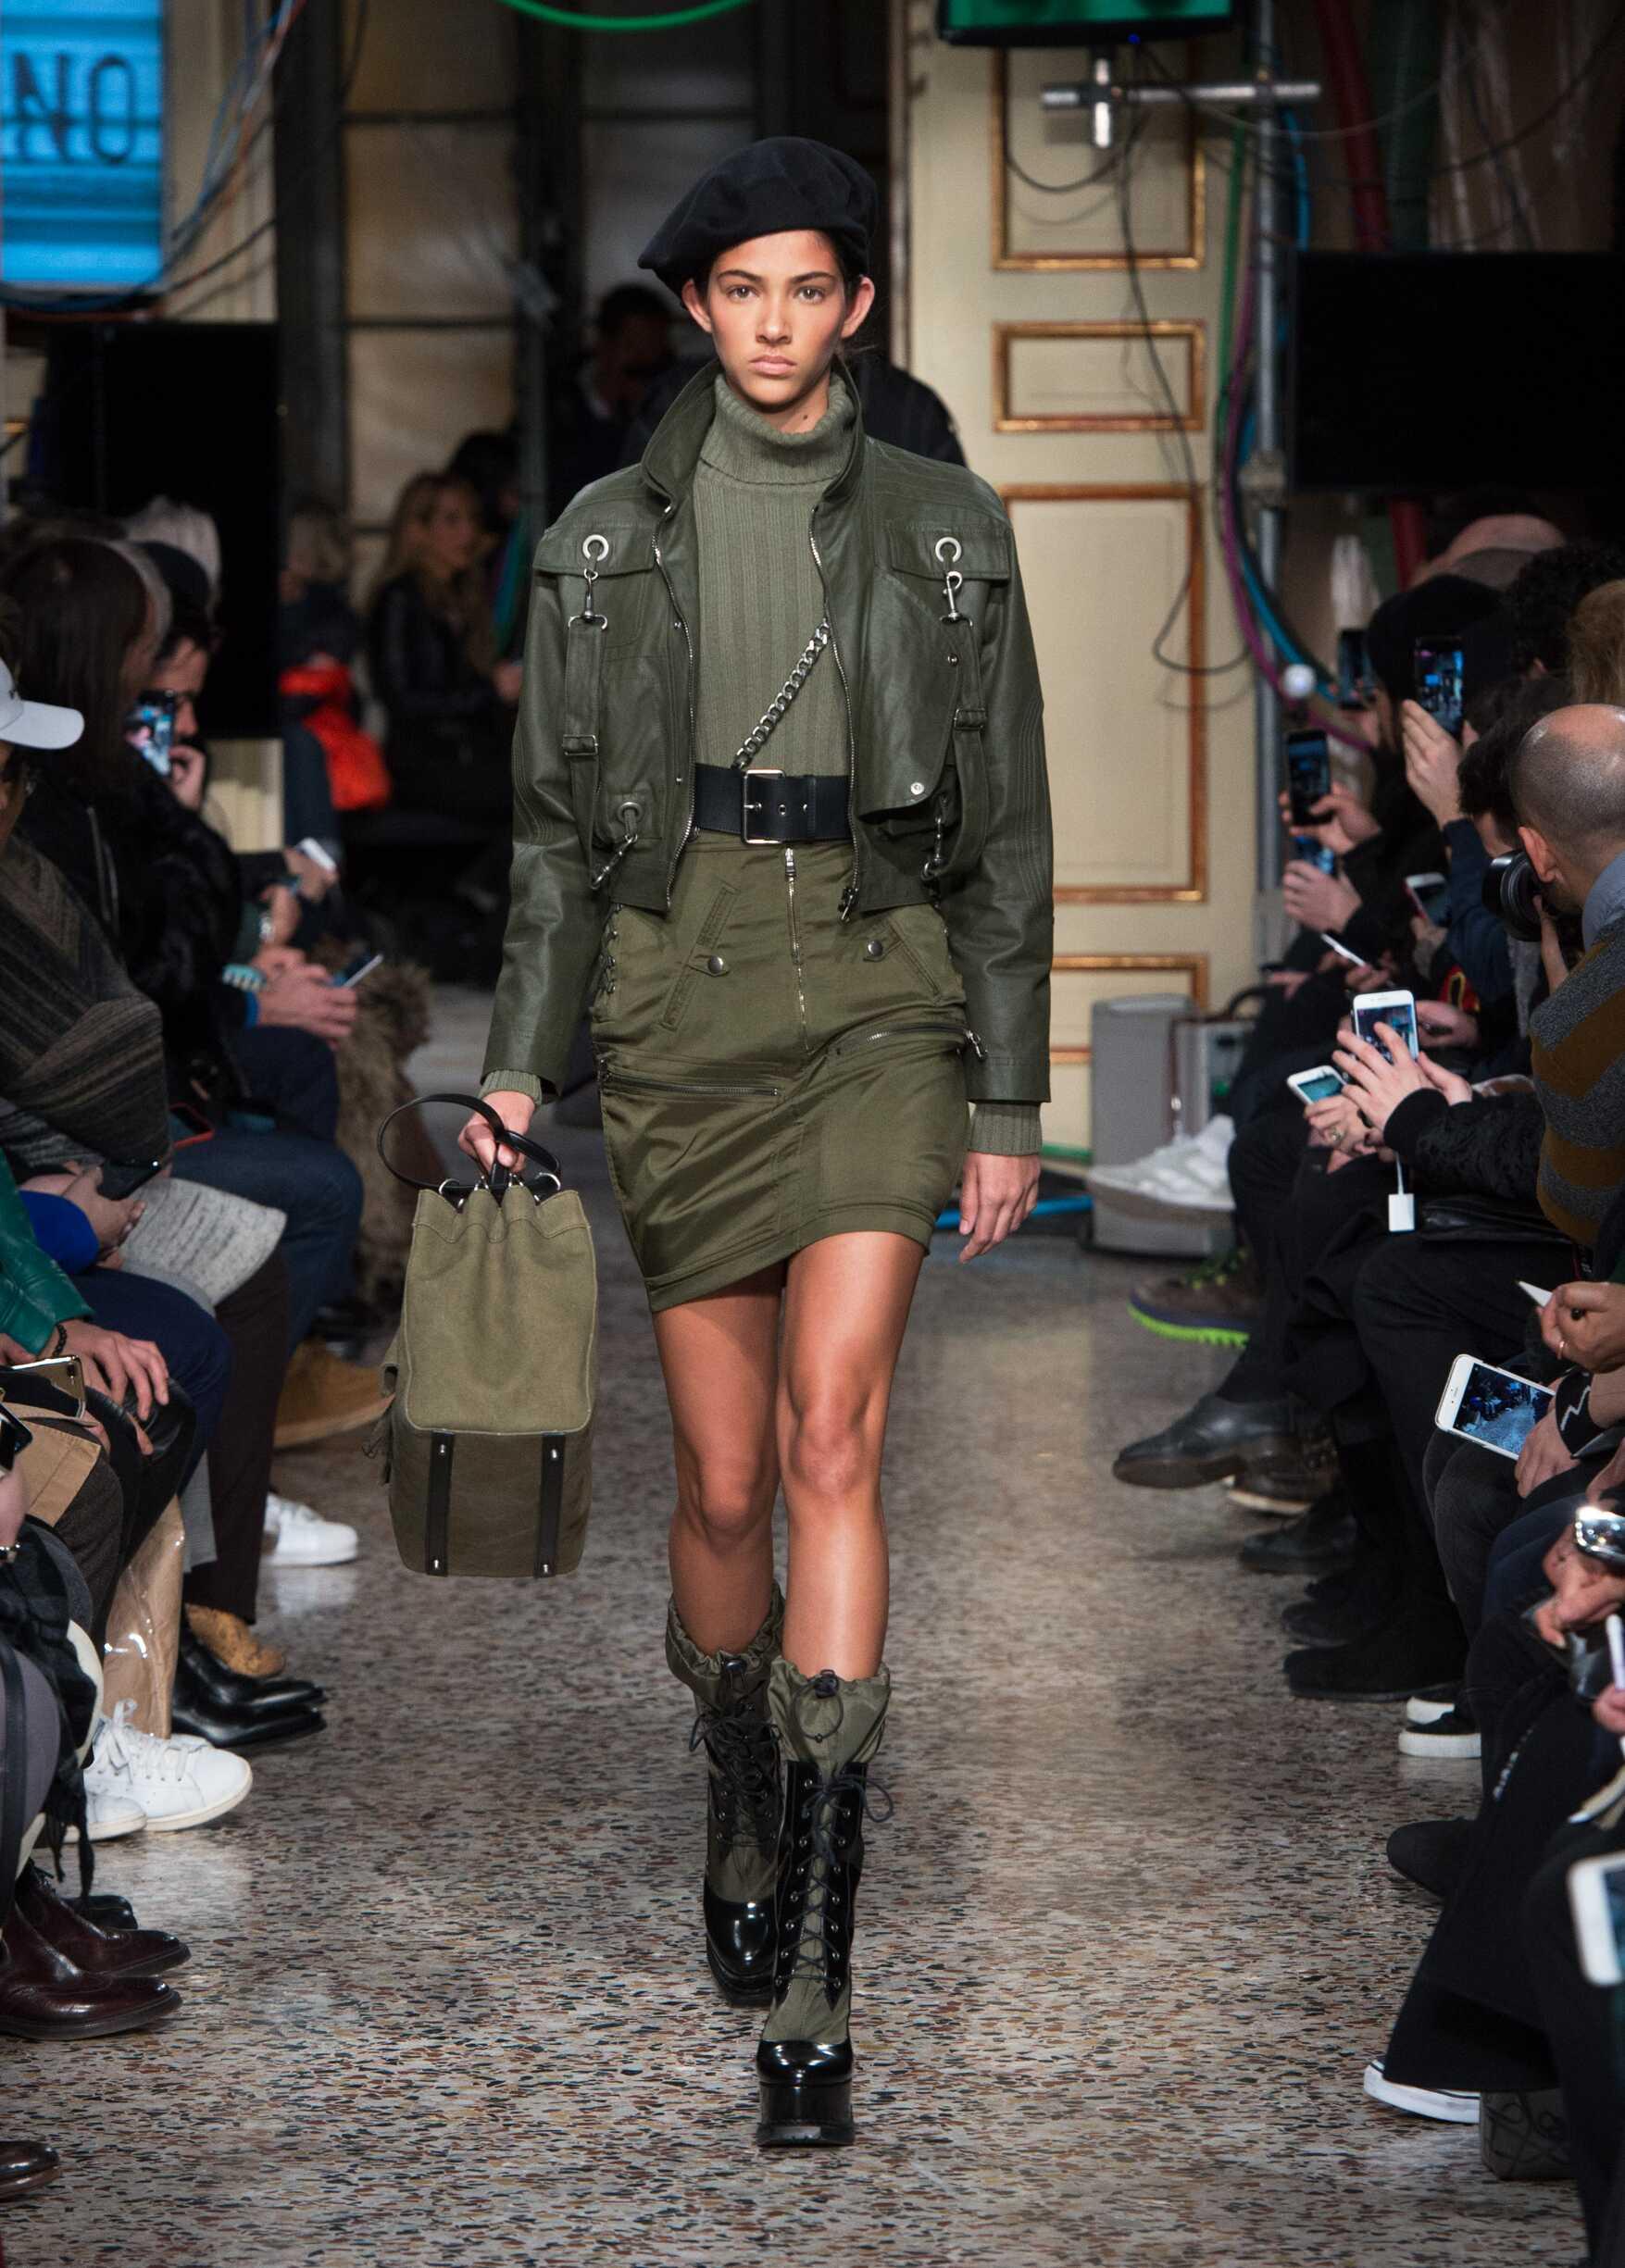 2017 Fashion Woman Model Moschino Catwalk